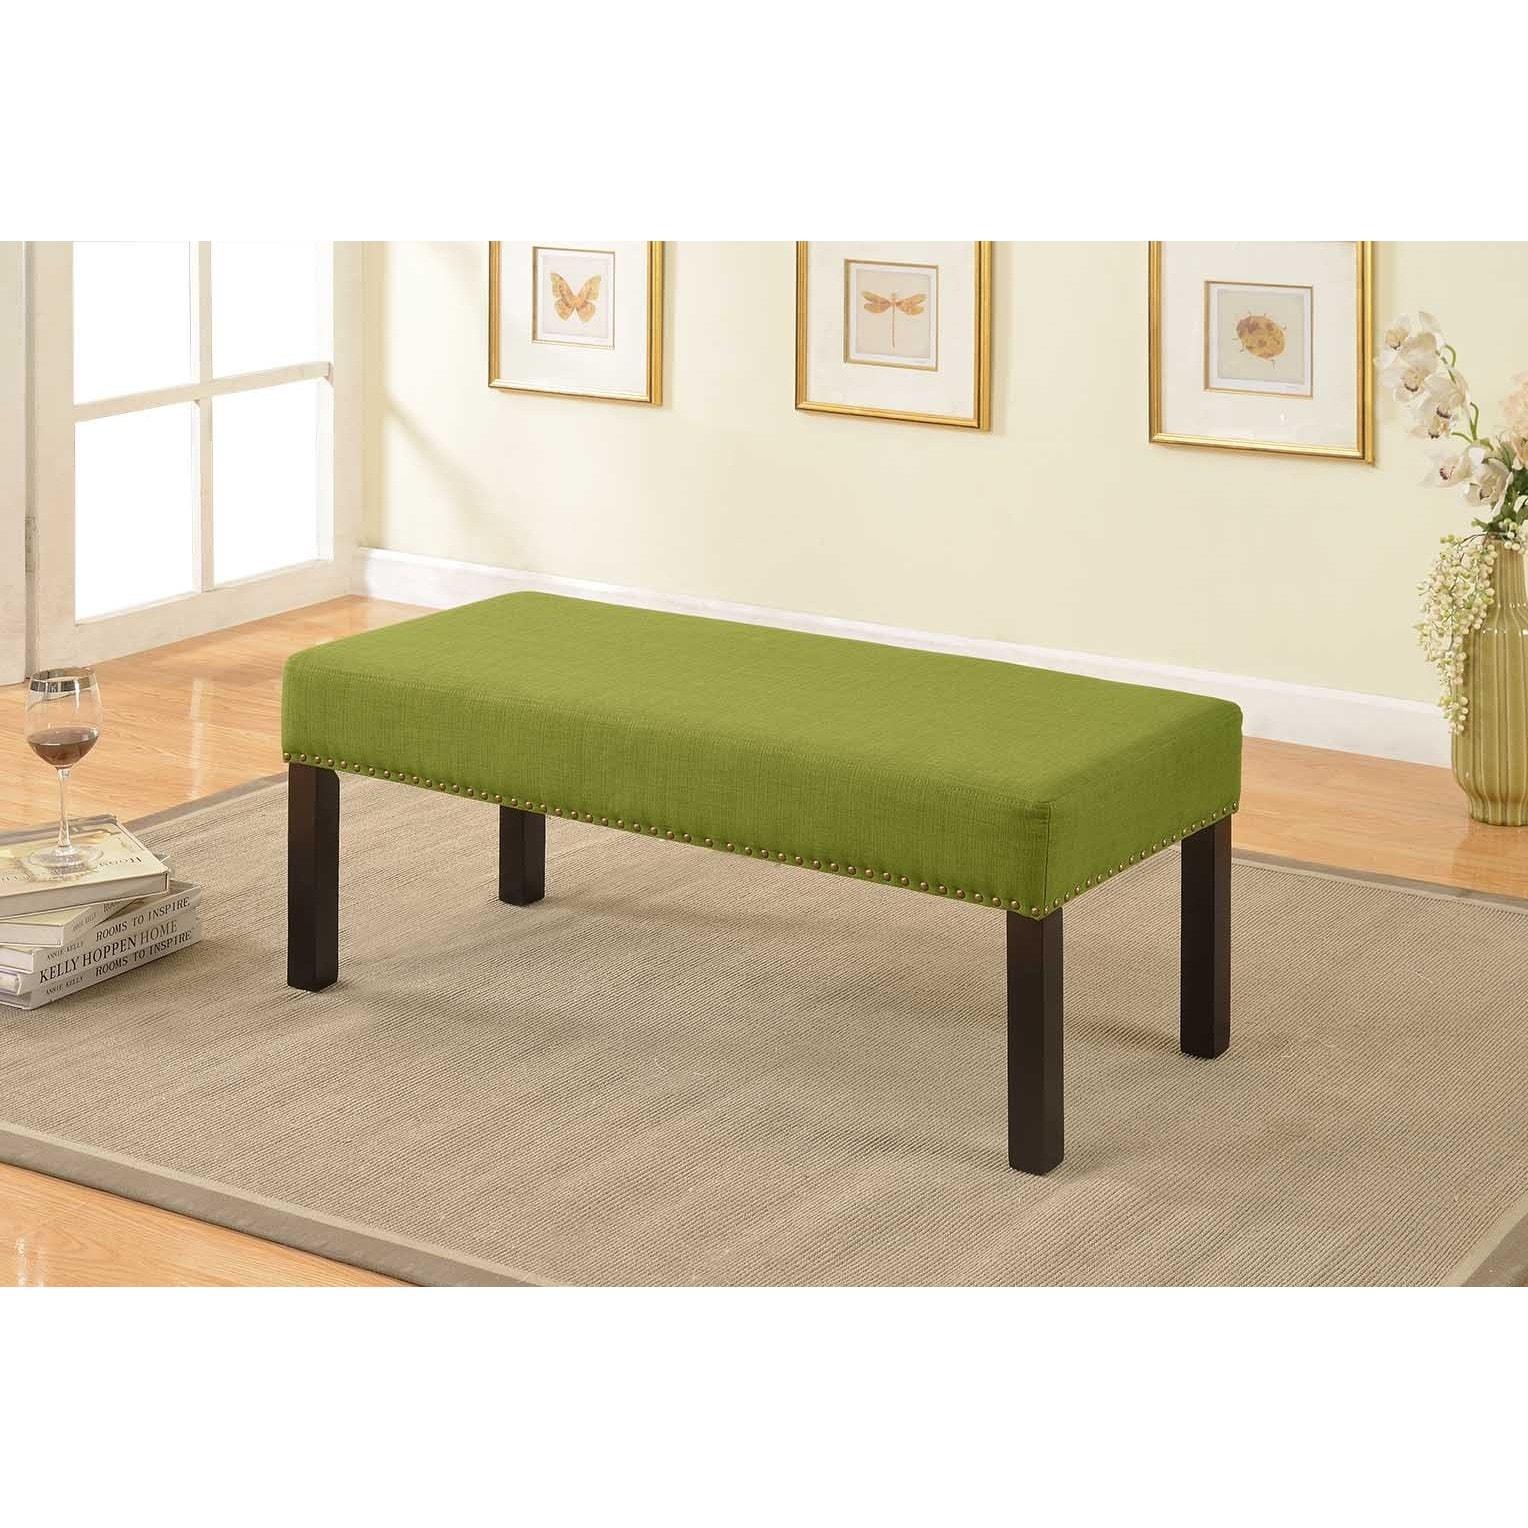 US Pride Furniture Alma Green Nail Trim Fabric Upholstere...